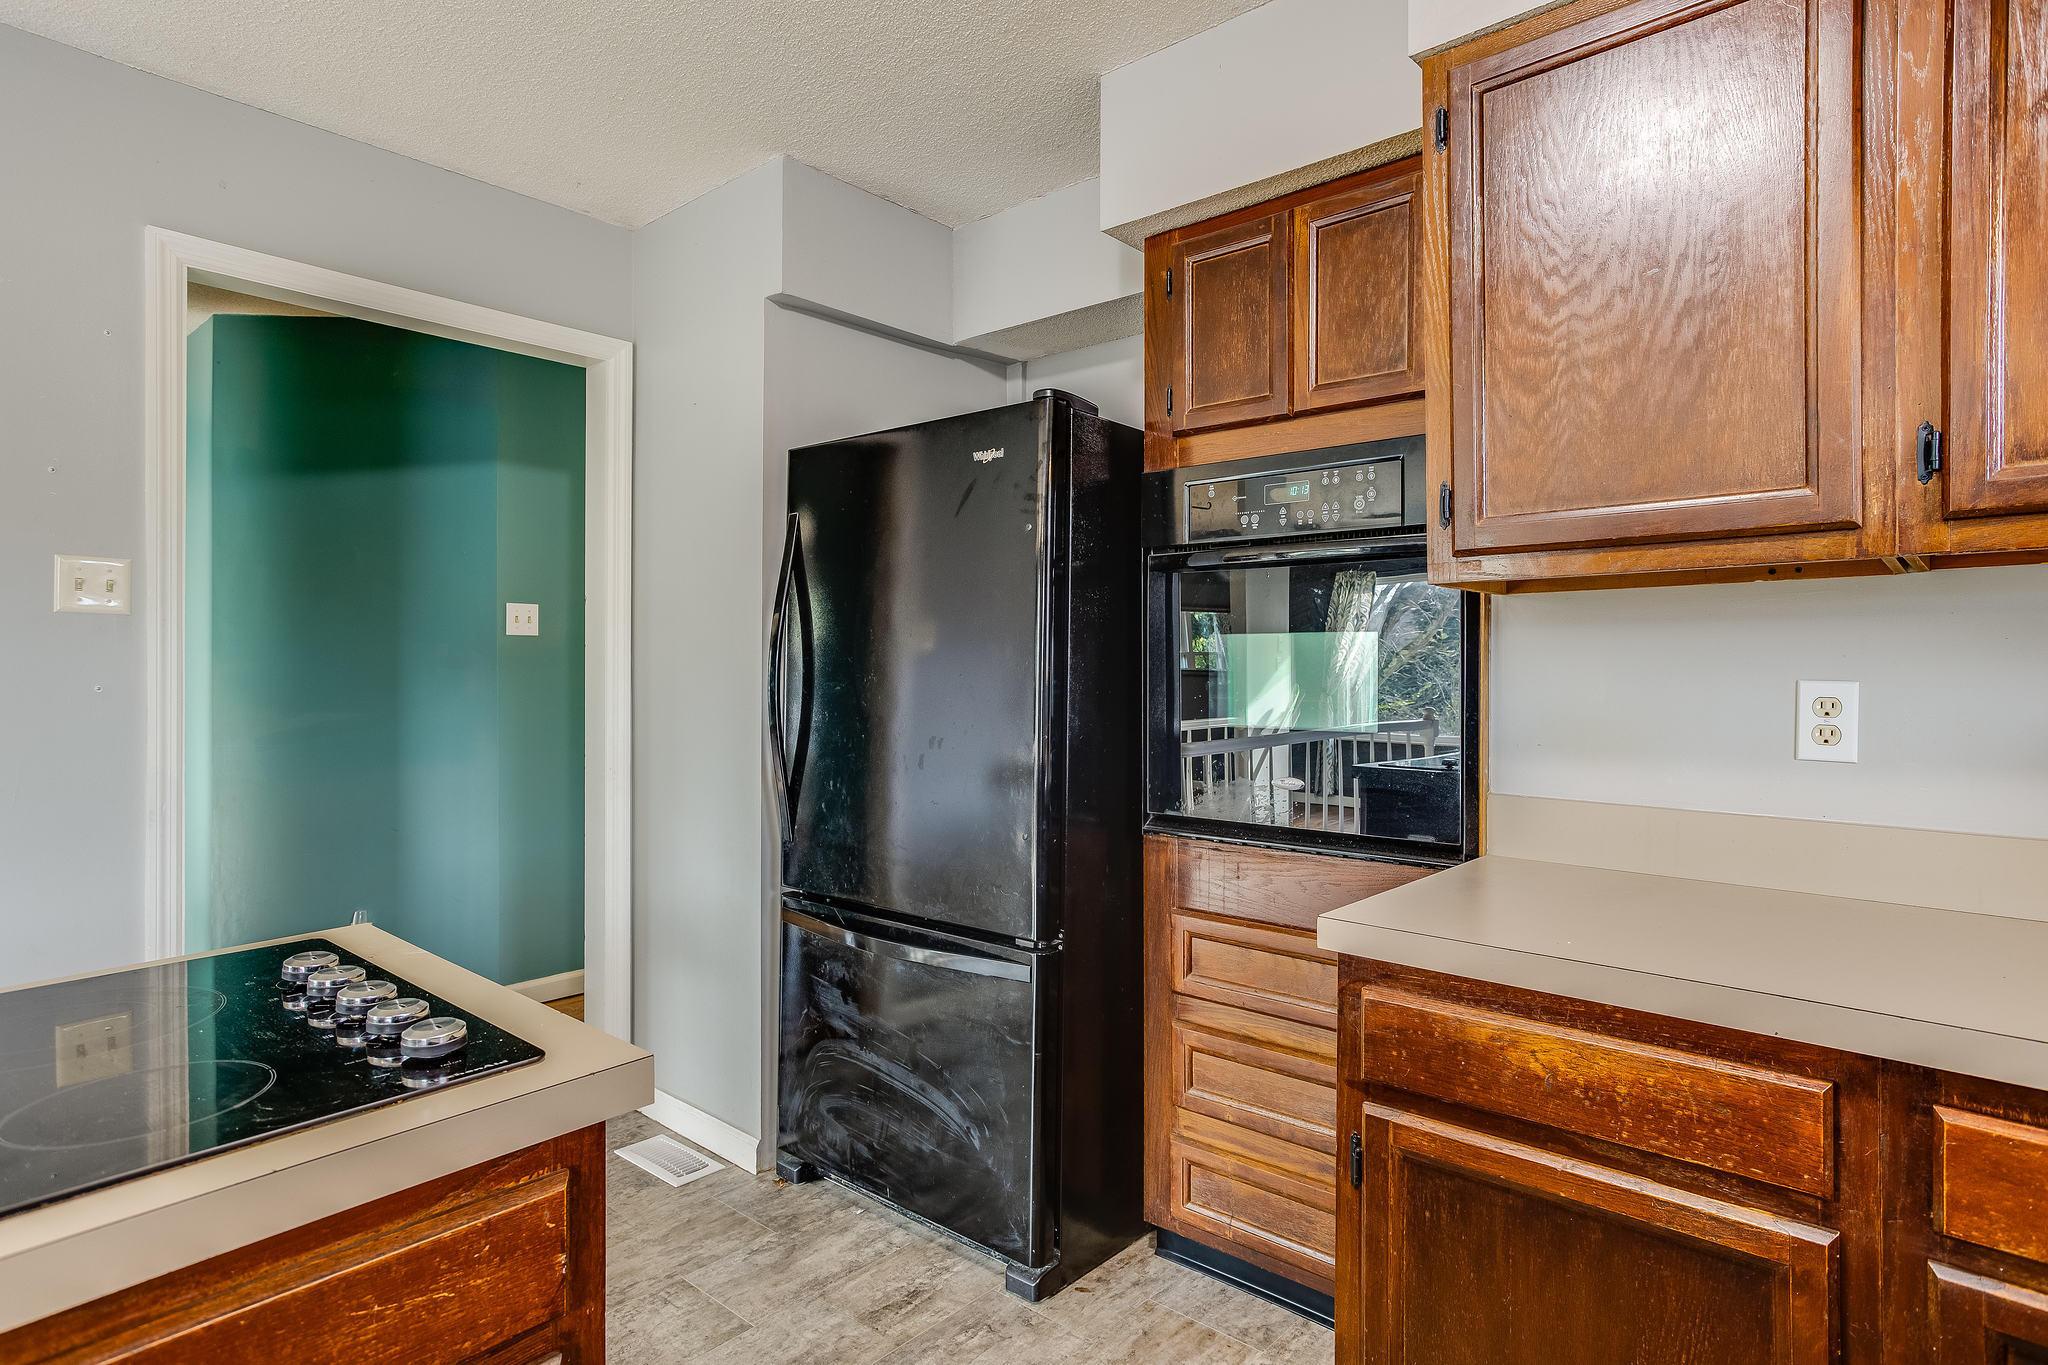 504 Bobolink Rd kitchen (1)